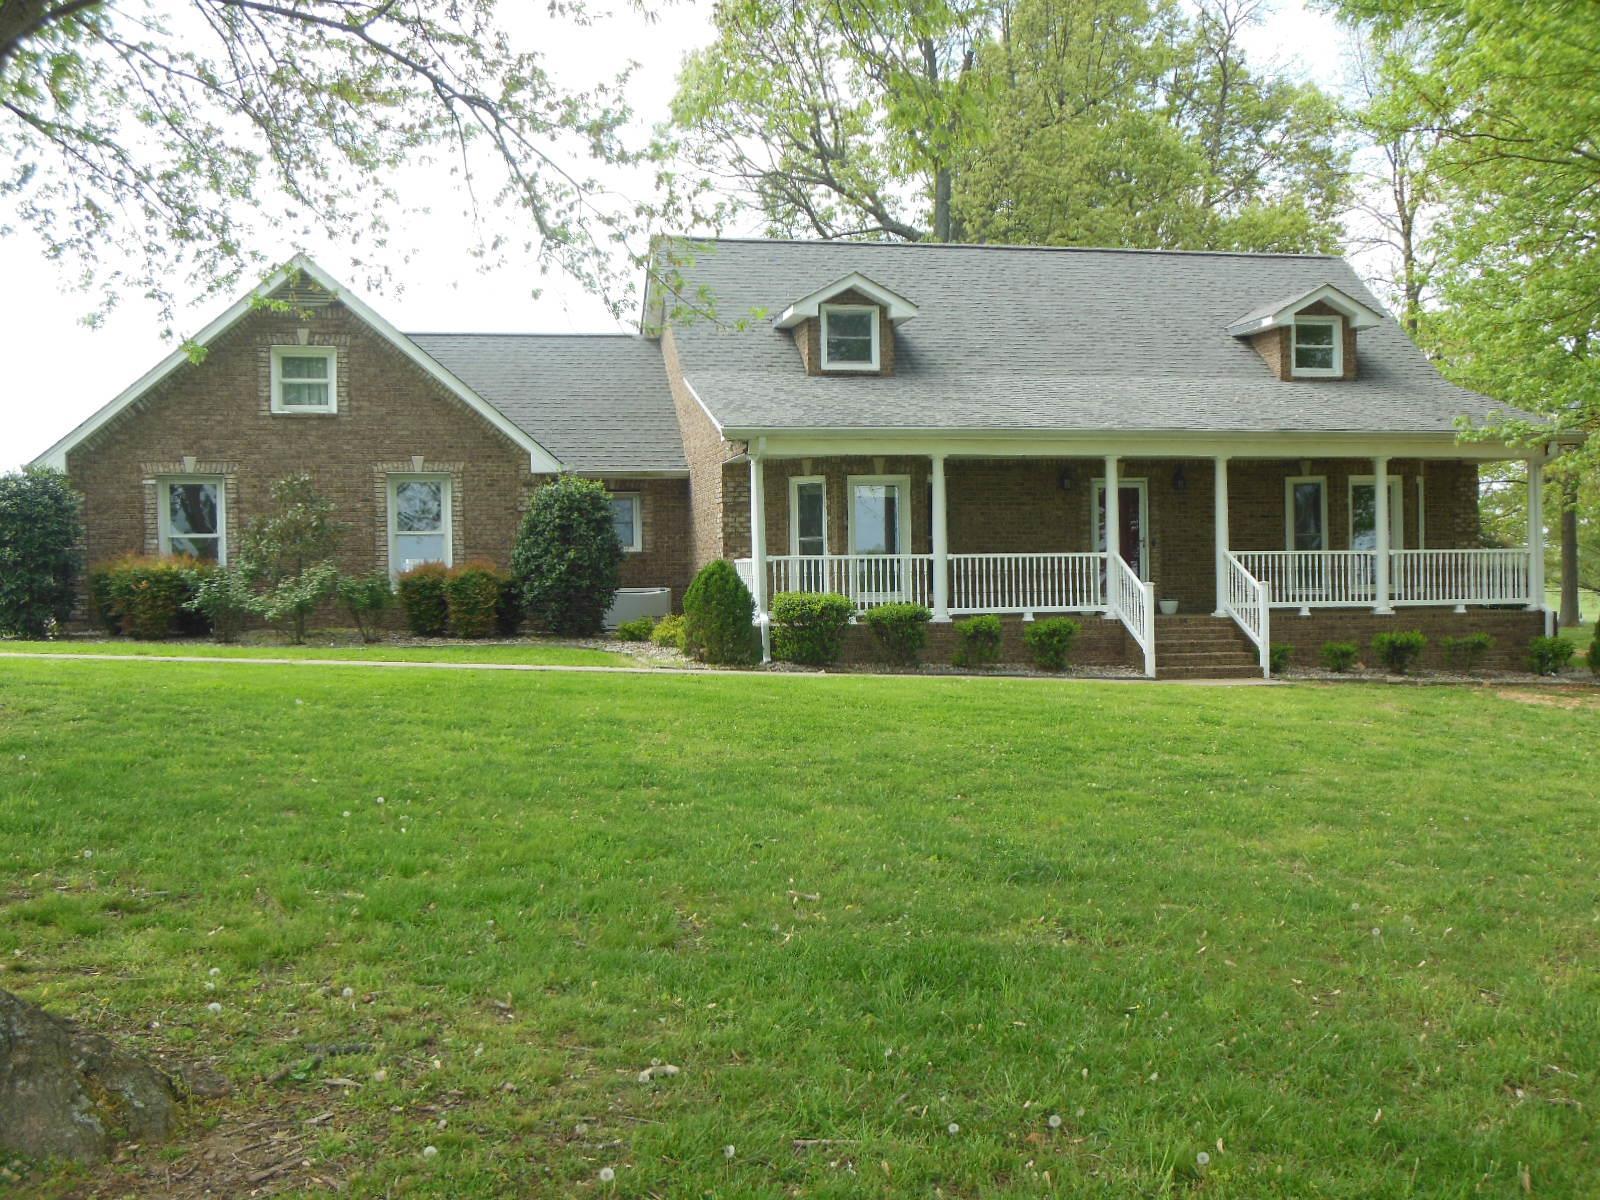 6074 Stroud Rd, Cedar Hill, TN 37032 - Cedar Hill, TN real estate listing